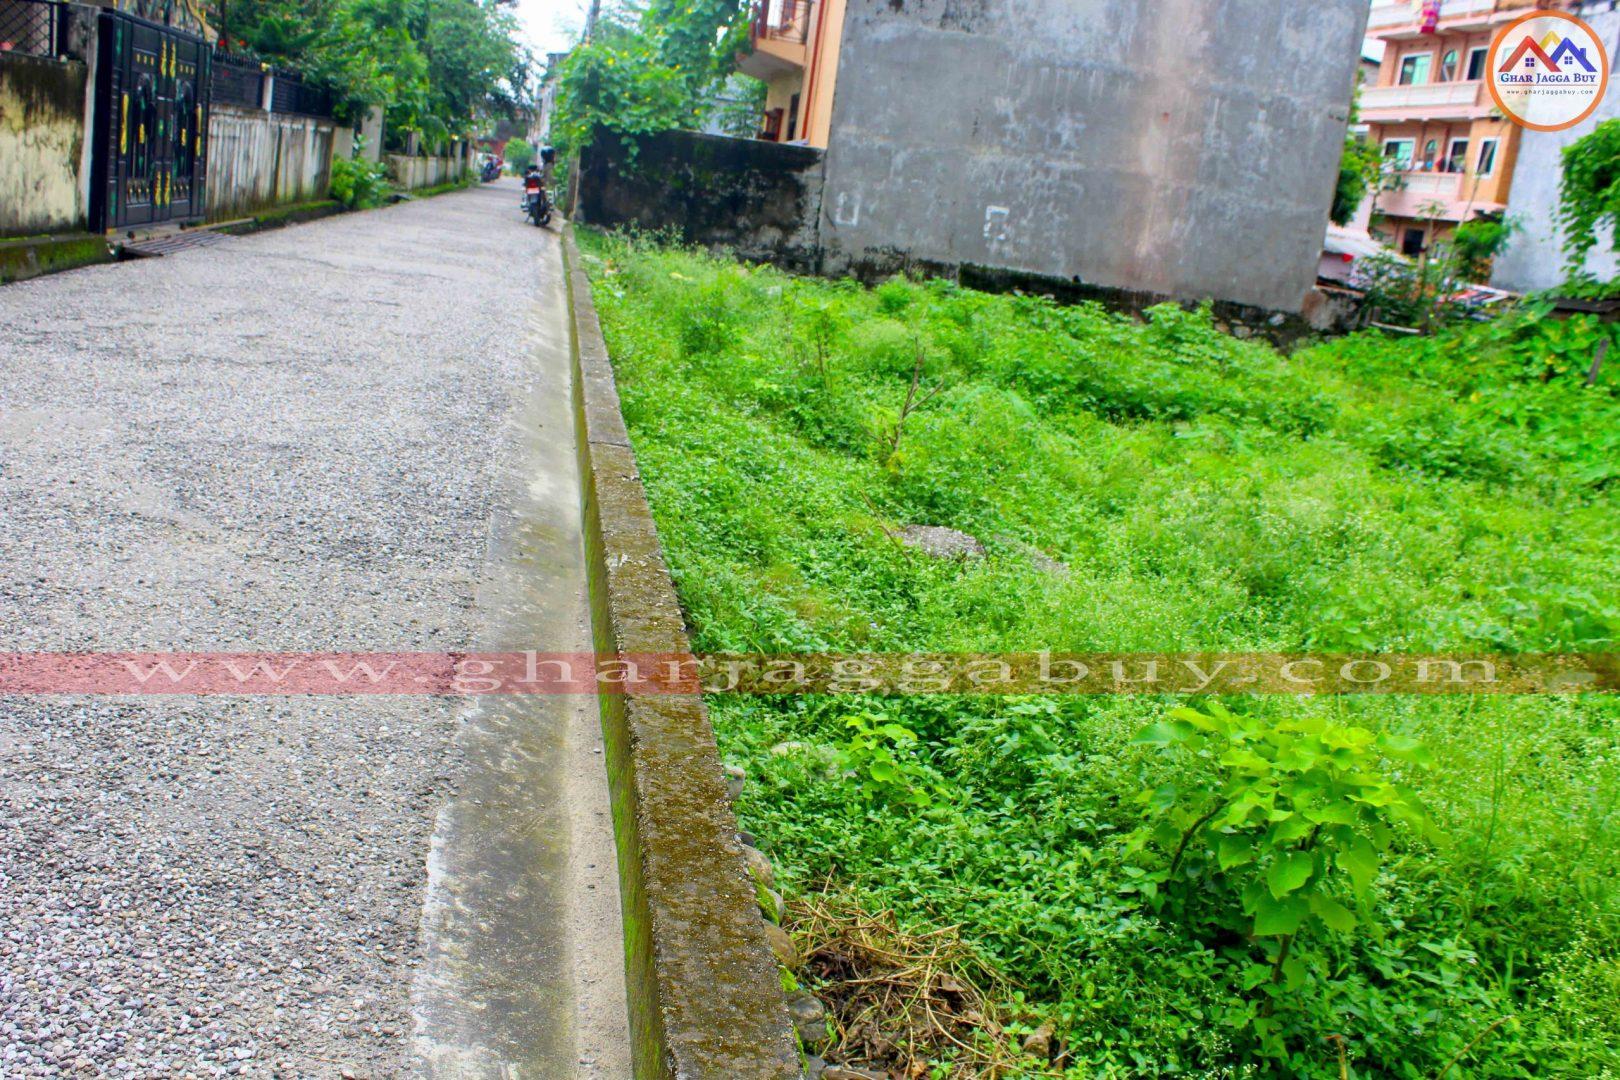 Land for sale in Butwal, Kalikanagar, Rupandehi